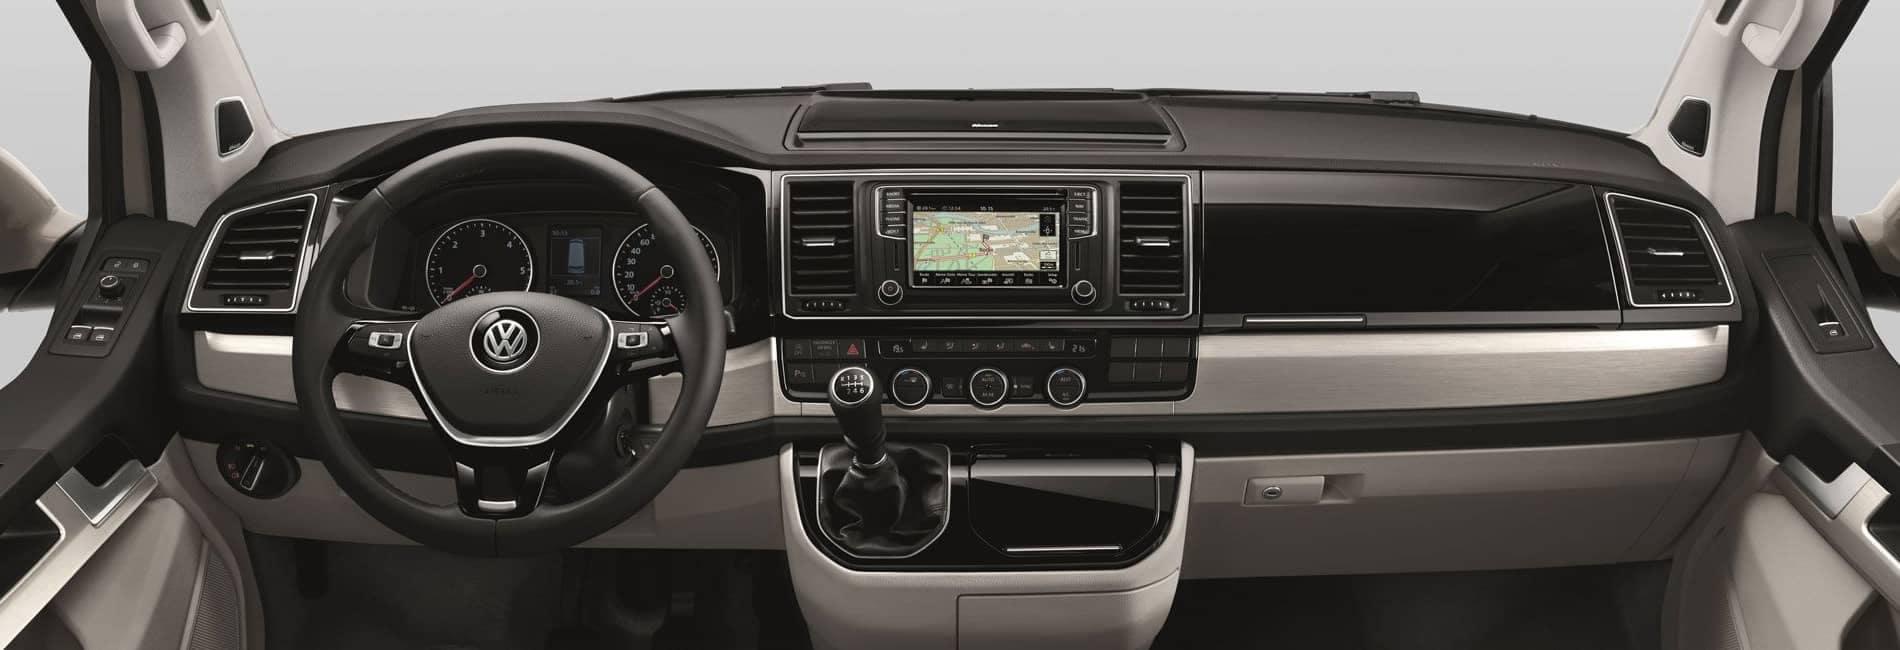 2016 Volkswagen-Dashboard